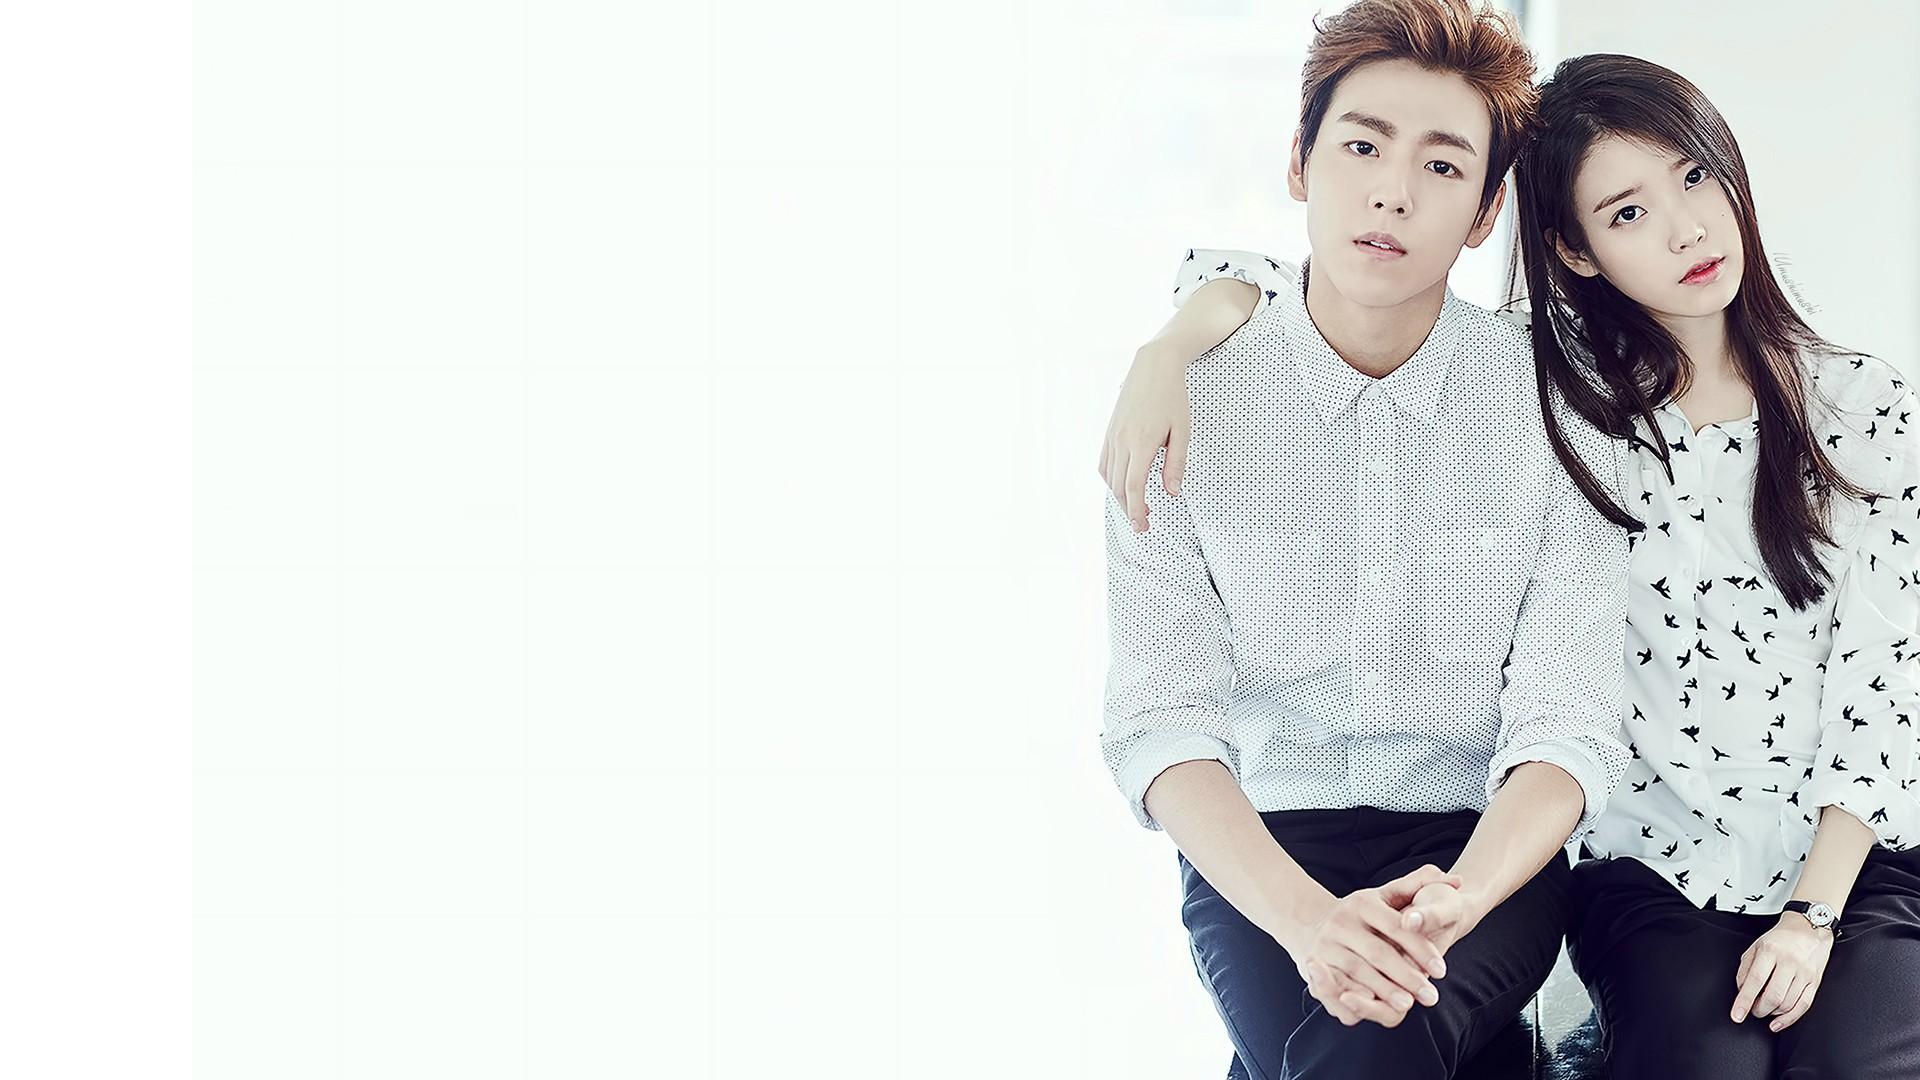 IU and LeeHyunWoo wallpaper 1920x1080